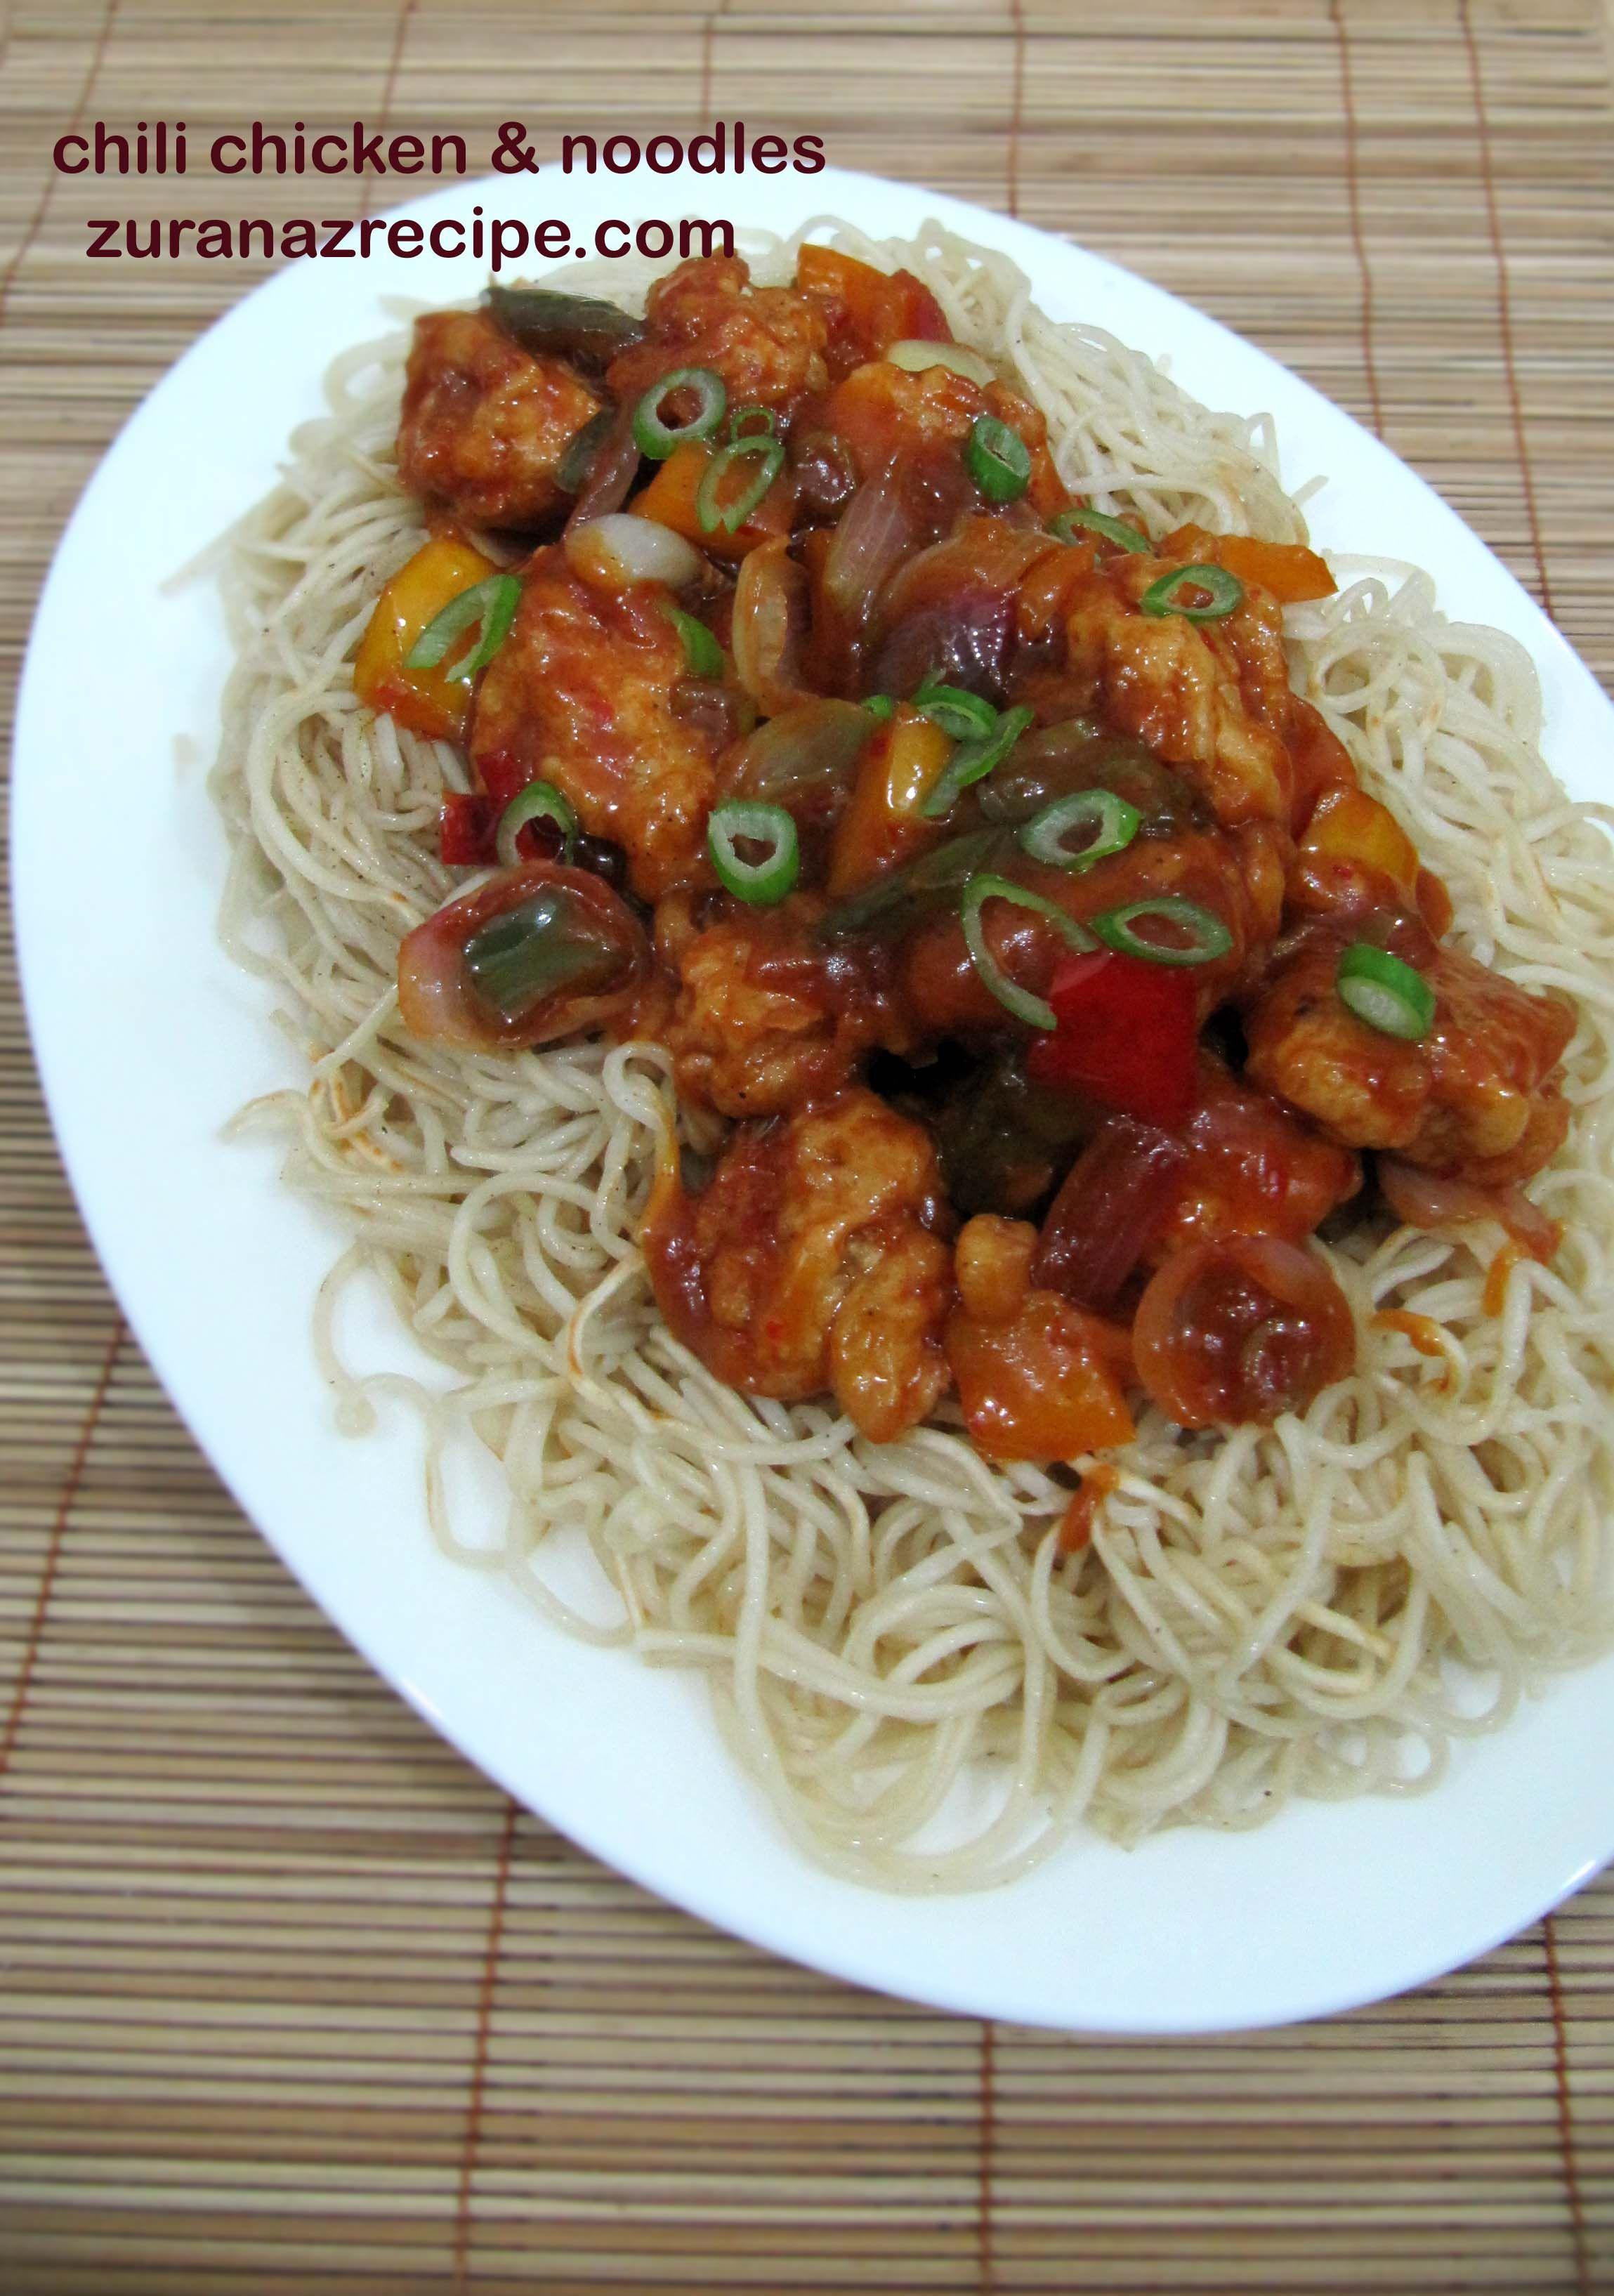 Piyaju lentil fritters bangla bangladeshi bengali food piyaju lentil fritters bangla bangladeshi bengali food recipes forumfinder Gallery